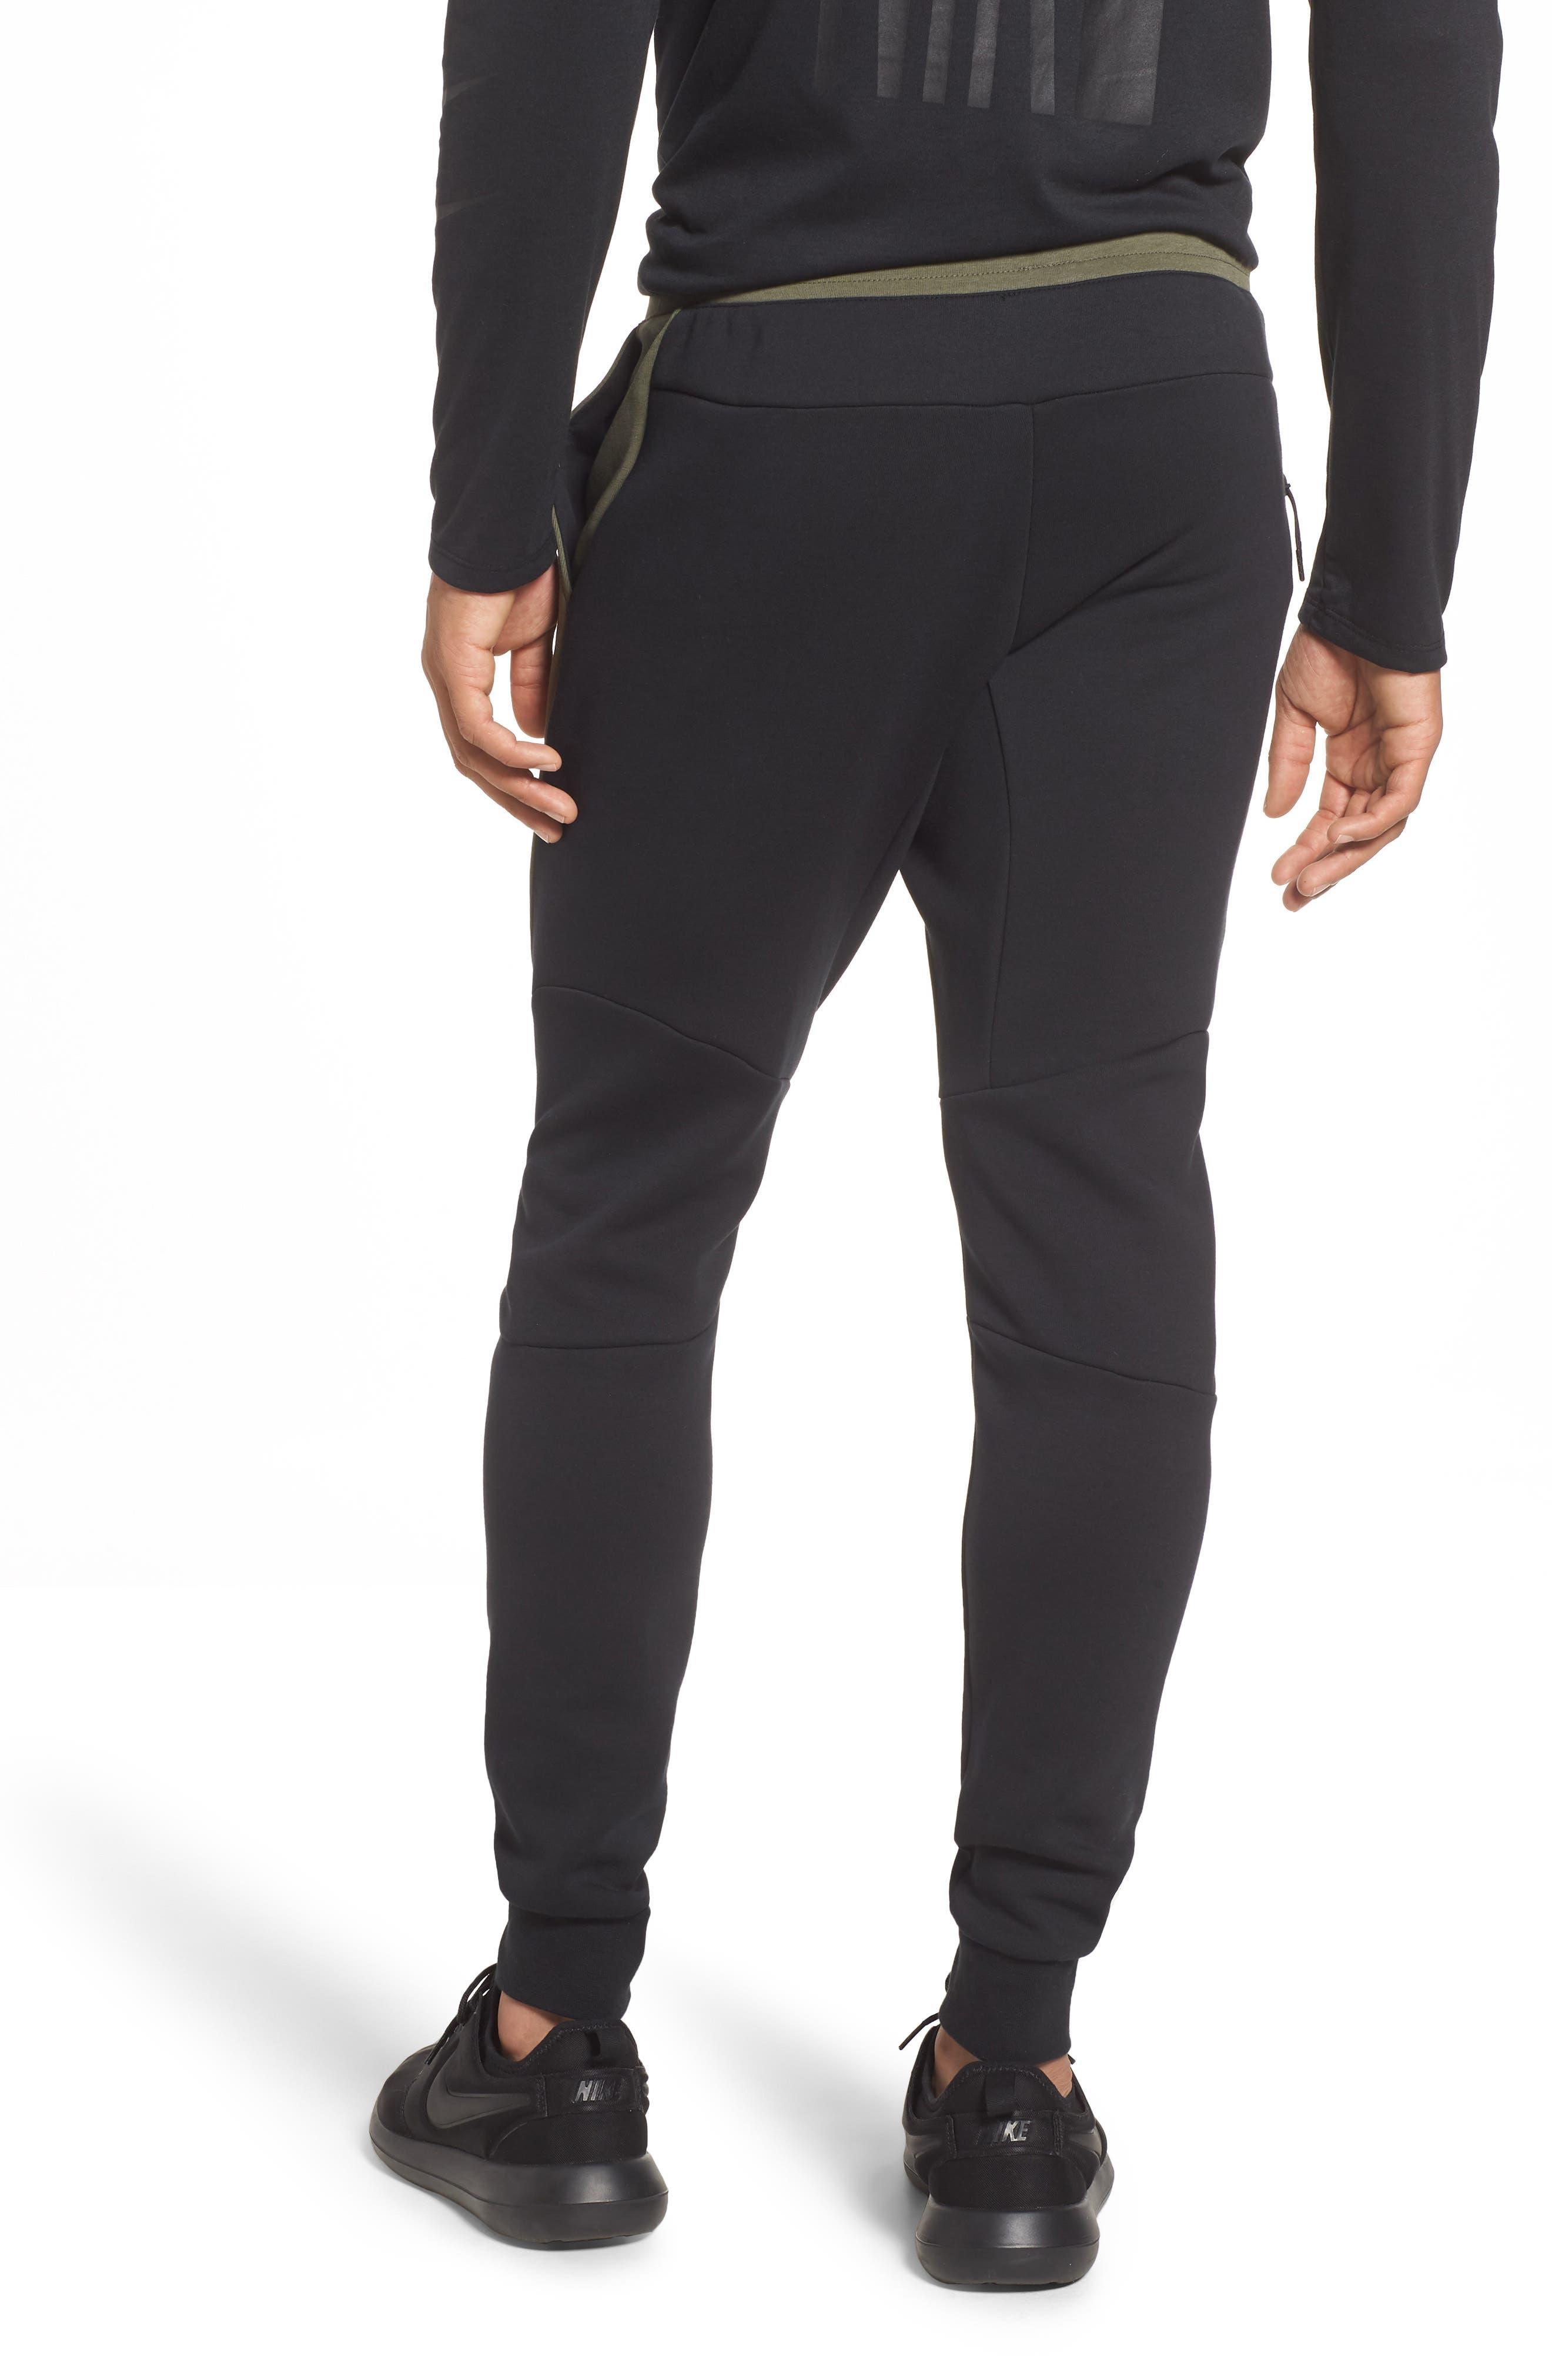 Tech Fleece Jogger Pants,                             Alternate thumbnail 2, color,                             BLACK/ TWILIGHT MARSH/ BLACK